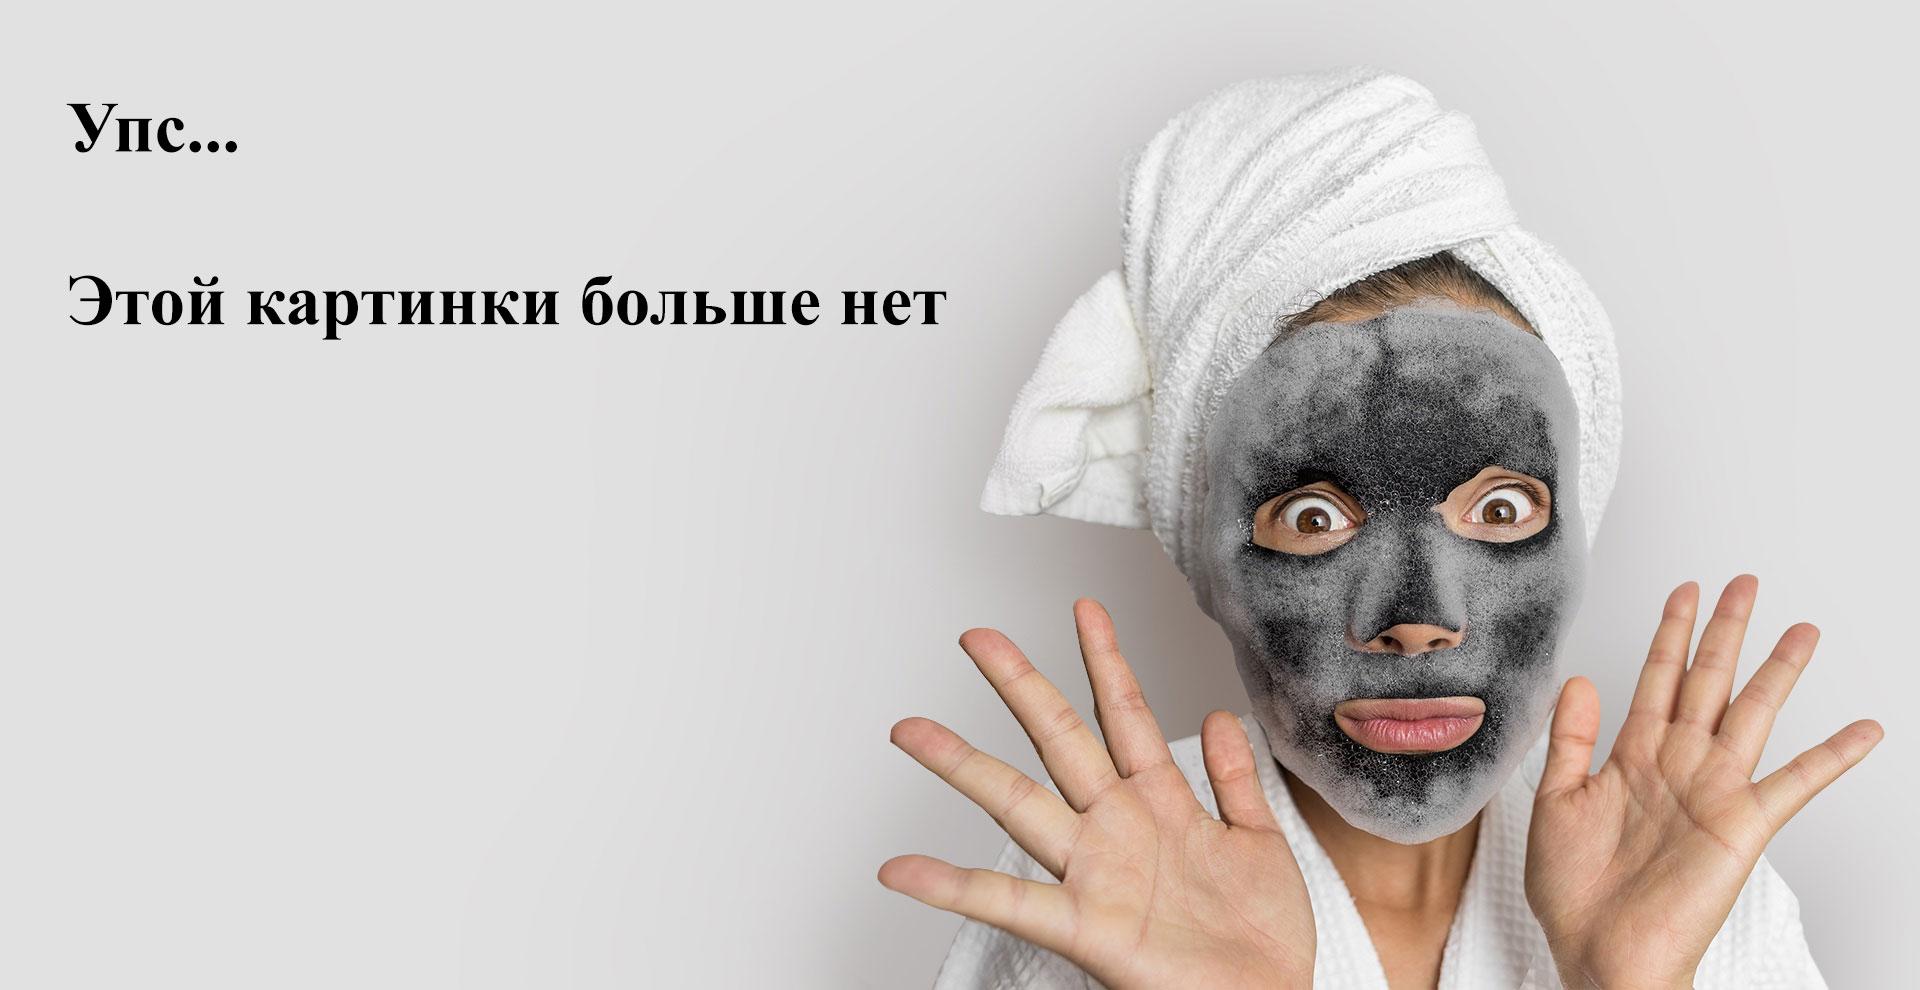 Patrisa Nail, Гель-лак №729 ВДНХ